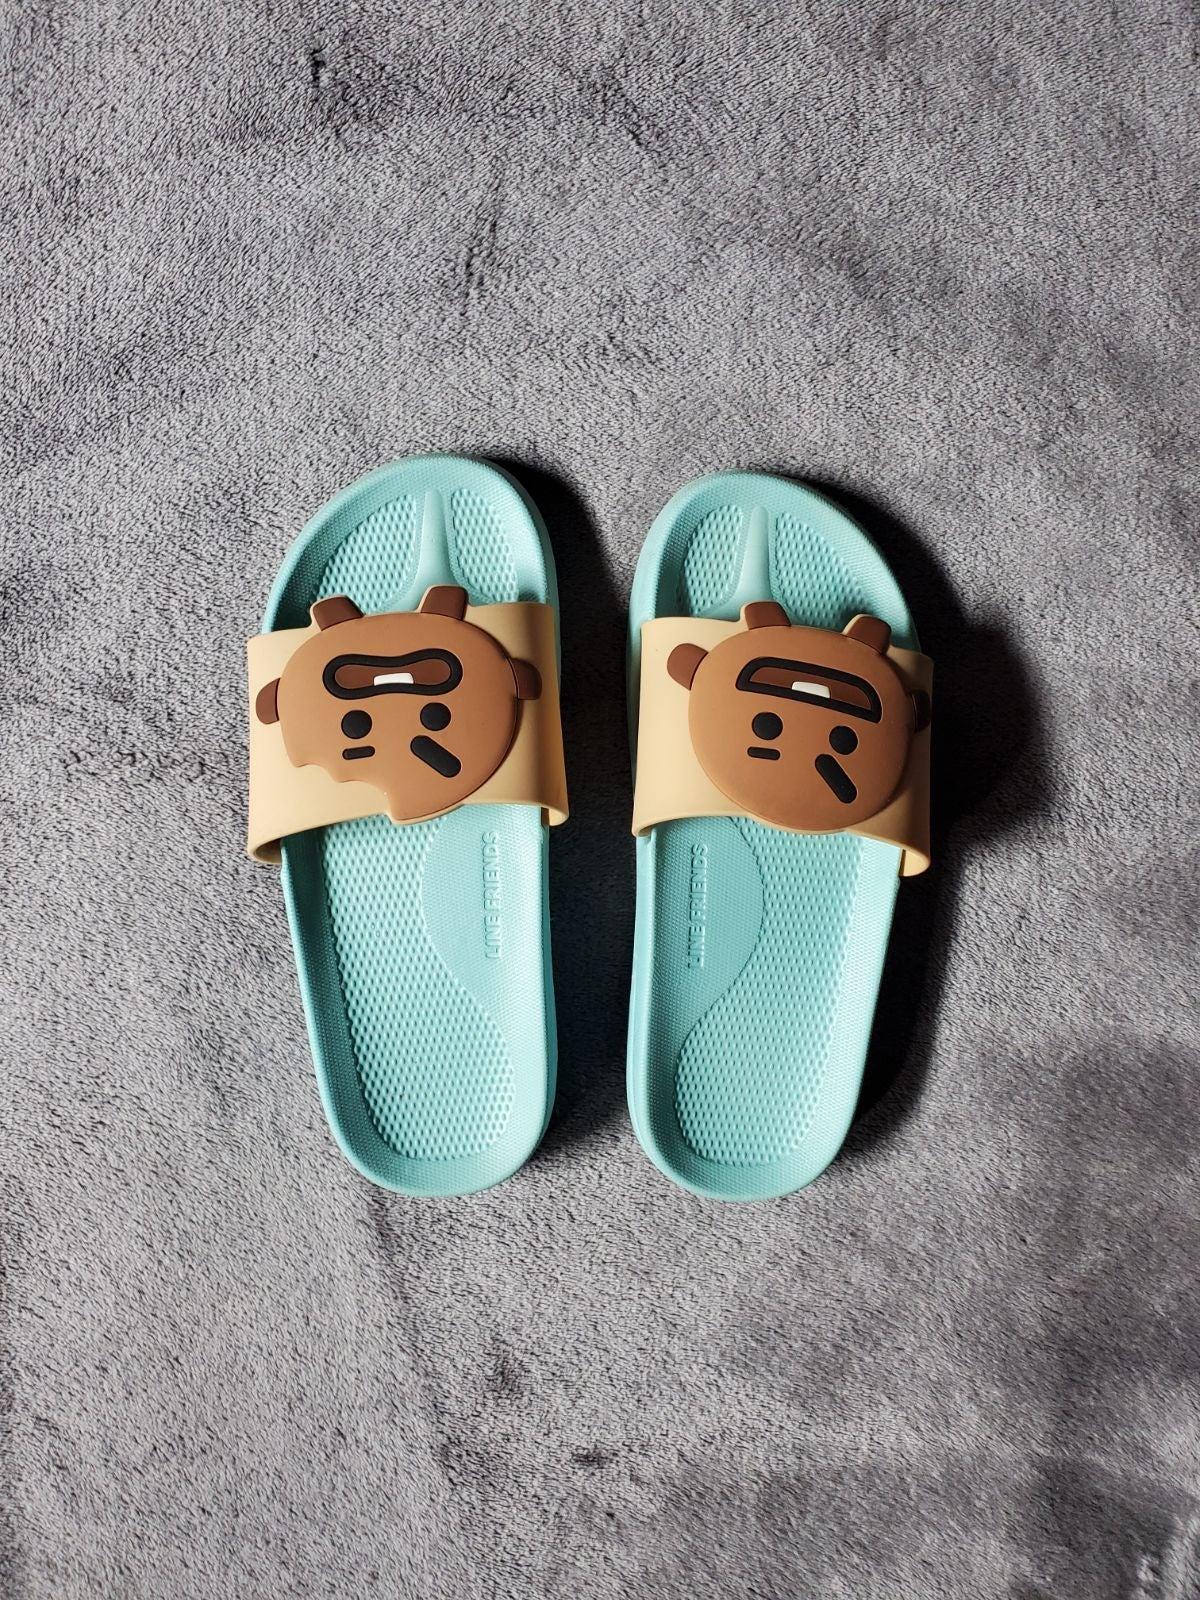 BT21 Shooky house slippers